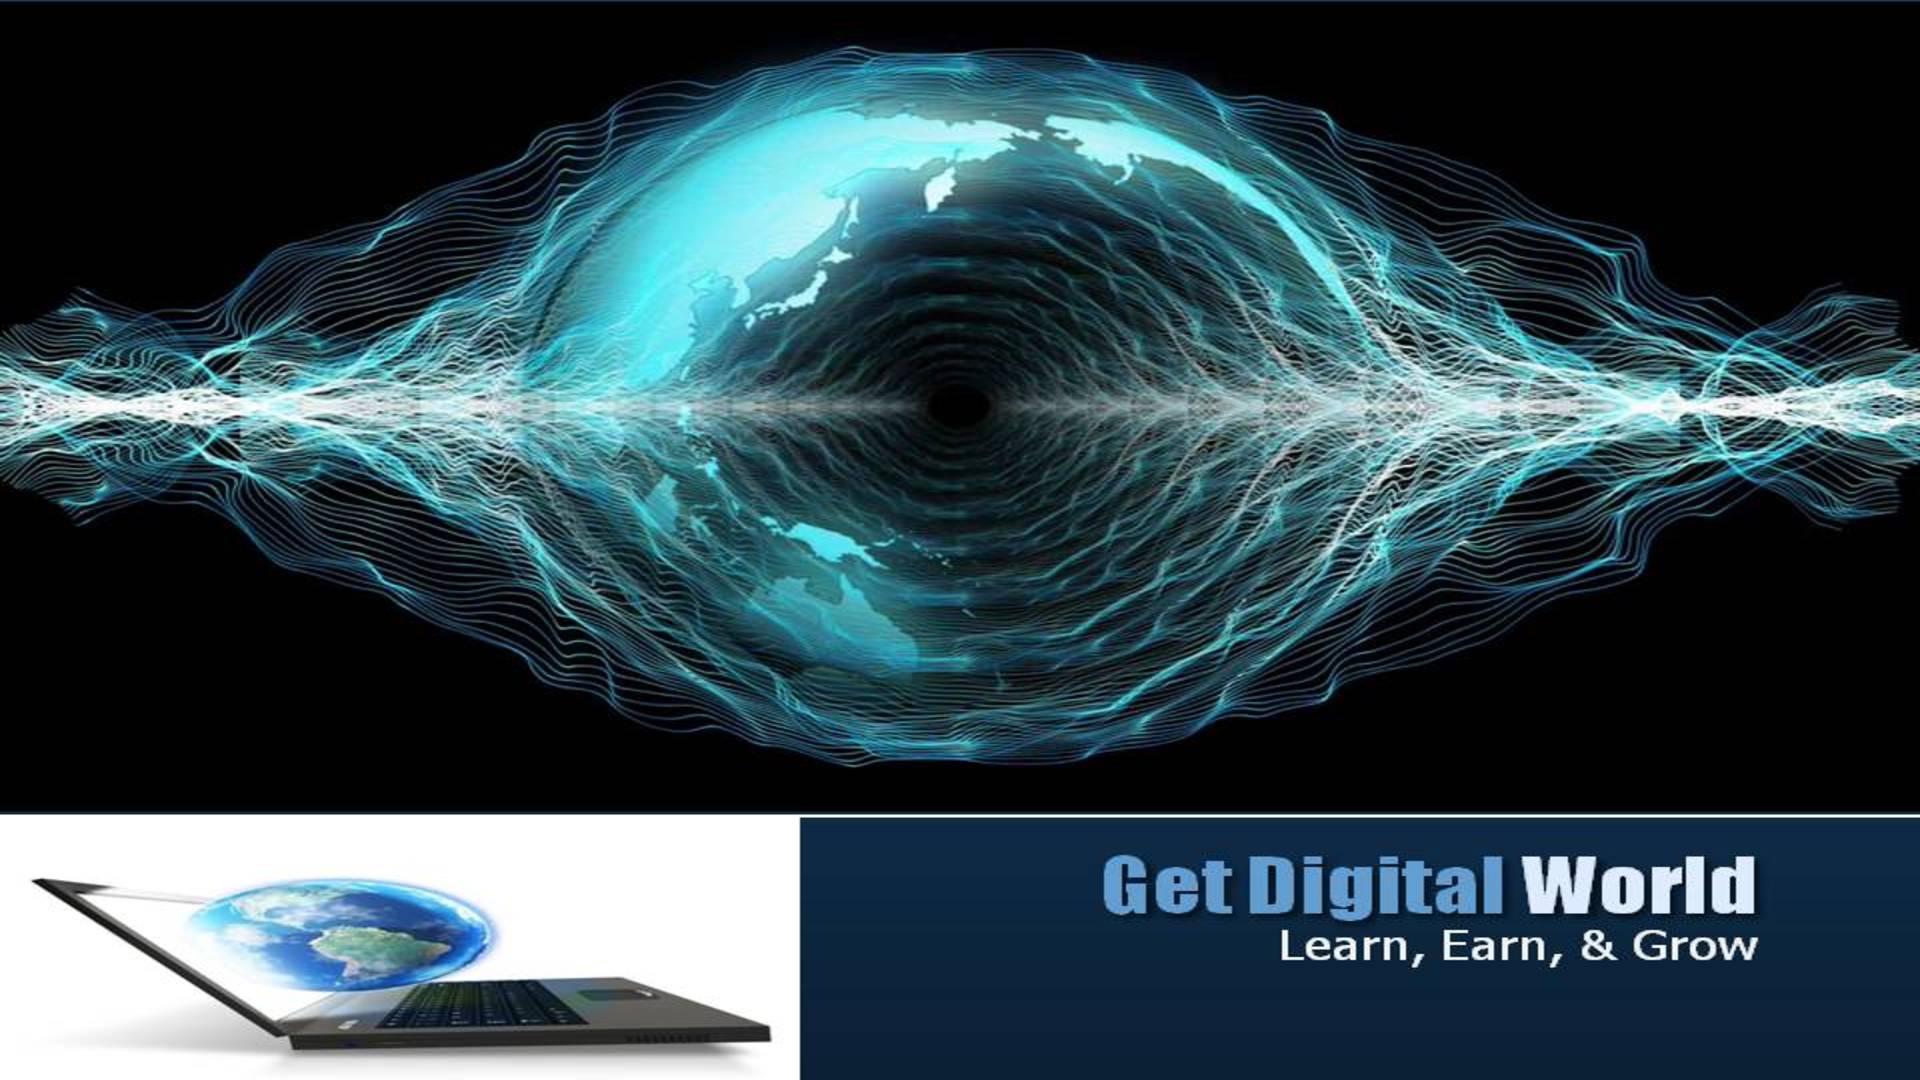 Avatar - Get Digital World